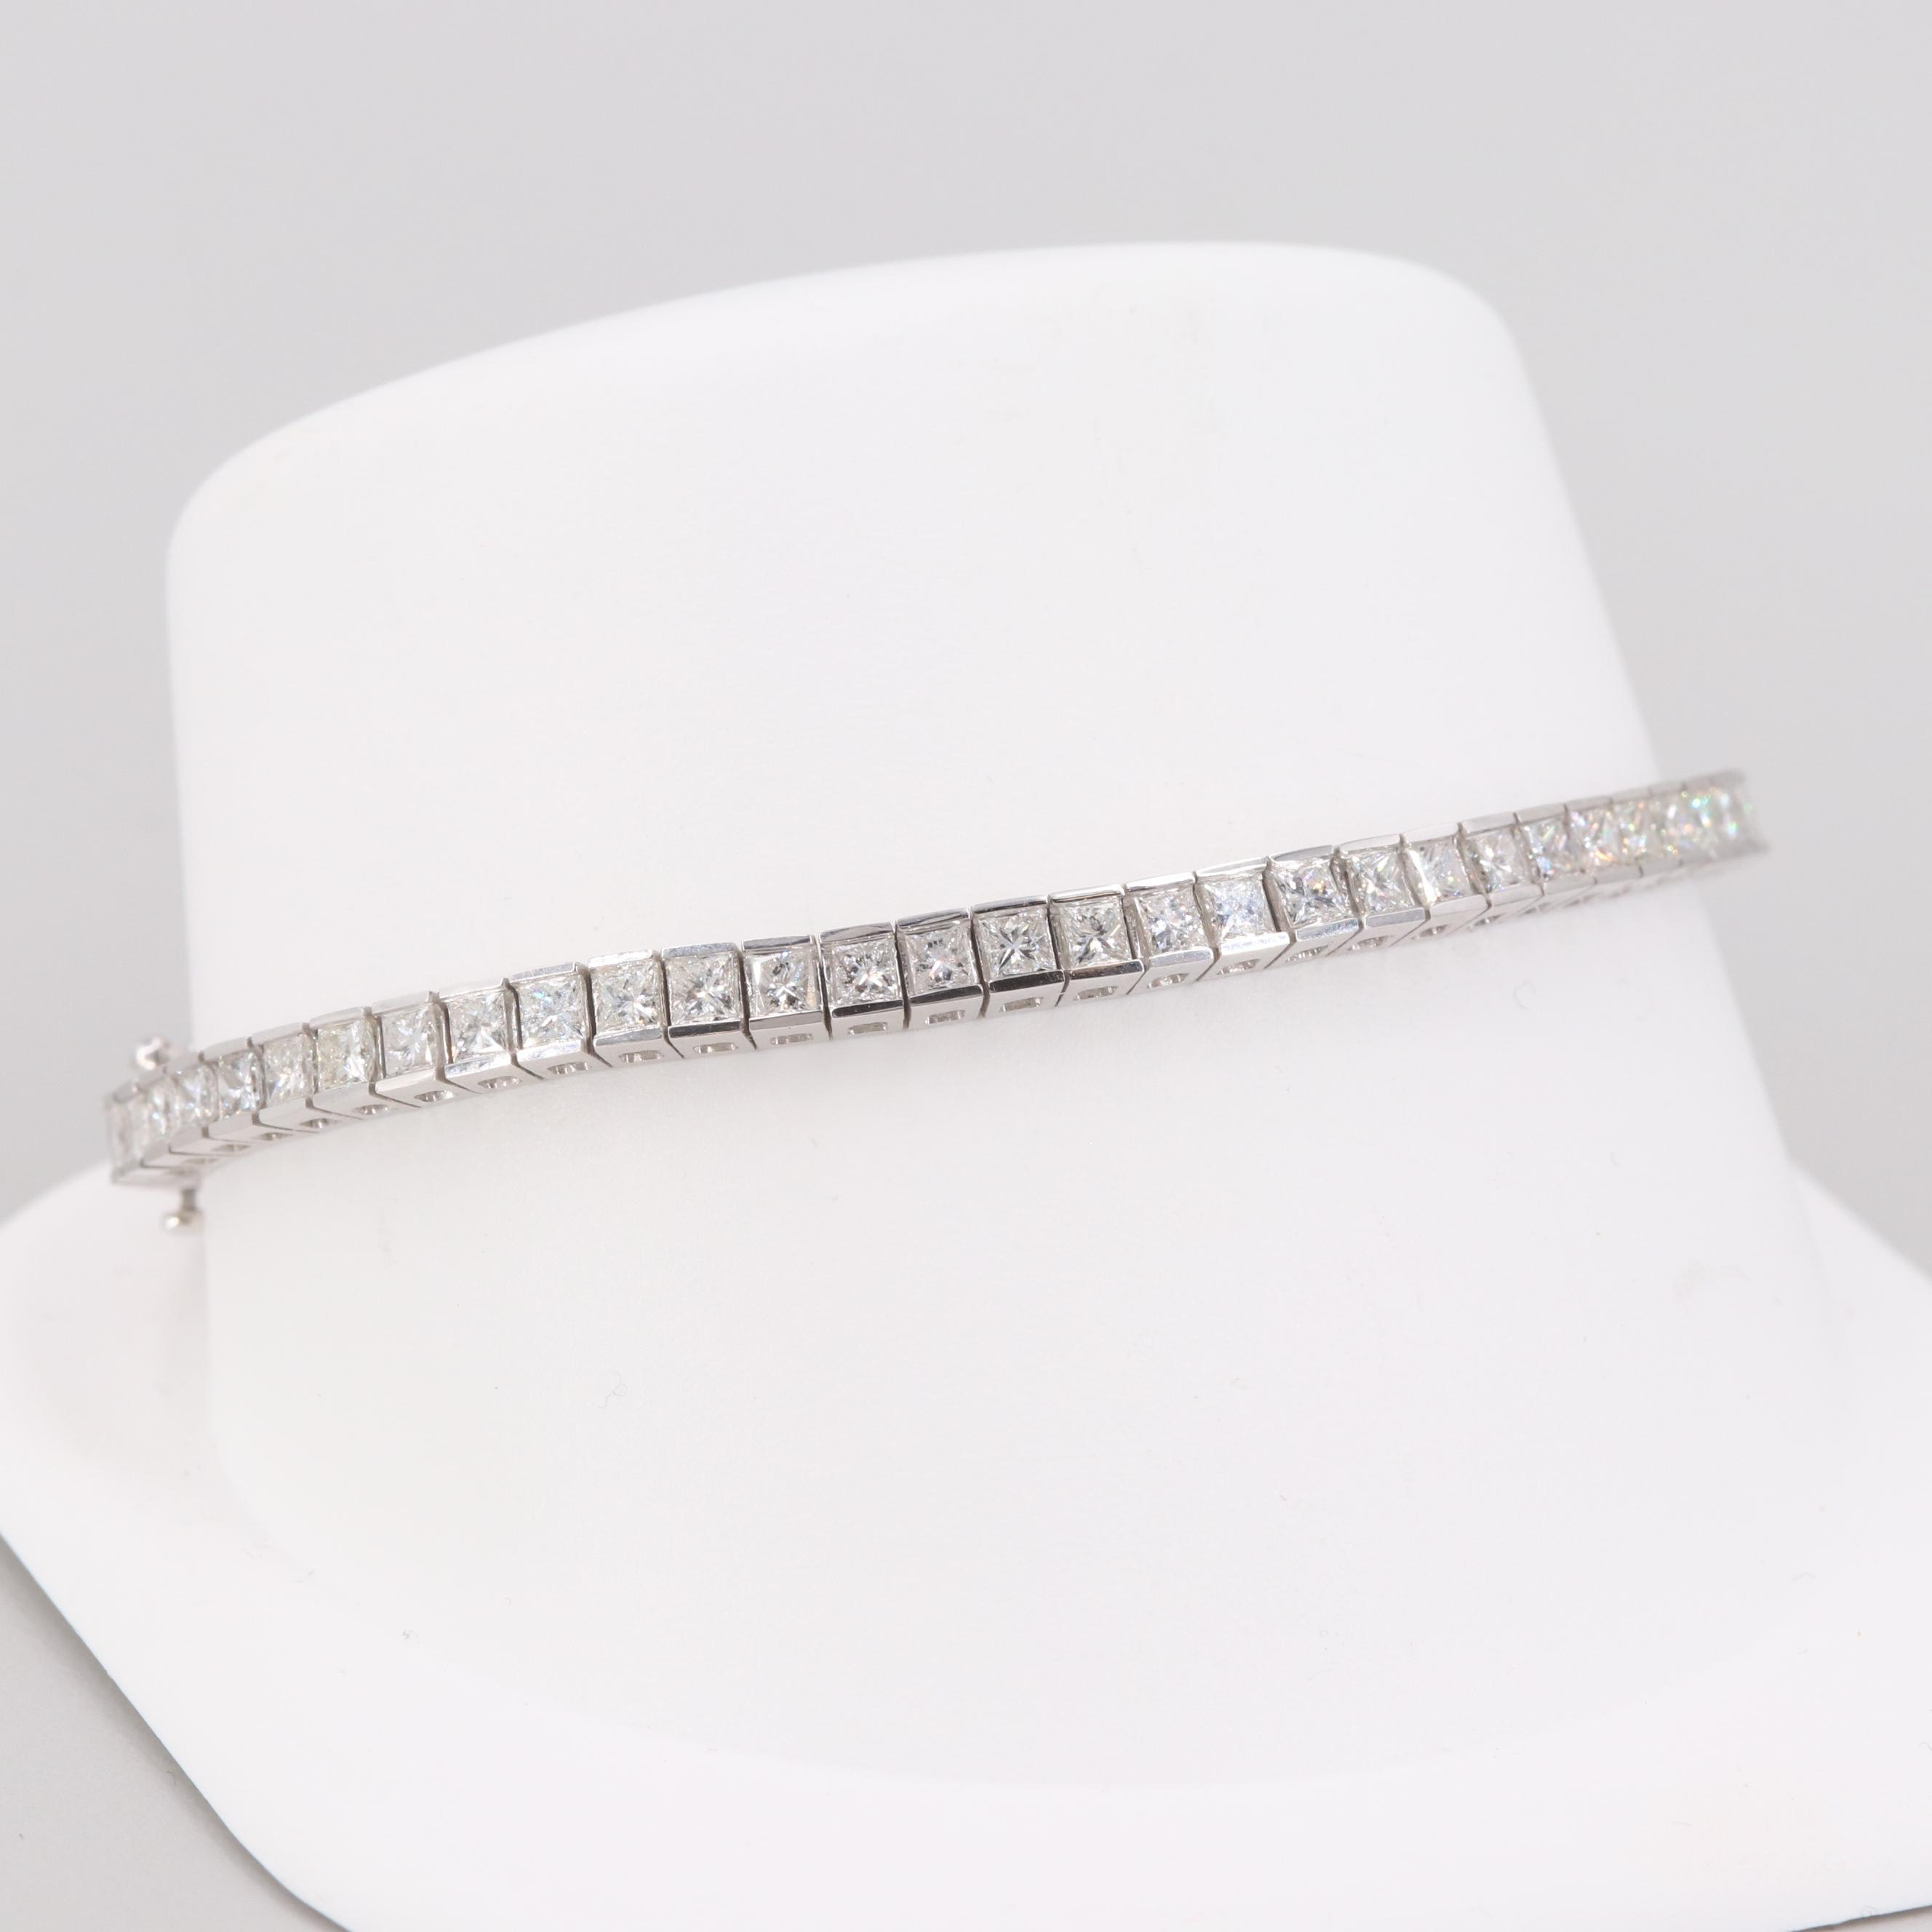 14K White Gold 4.96 CTW Diamond Bracelet